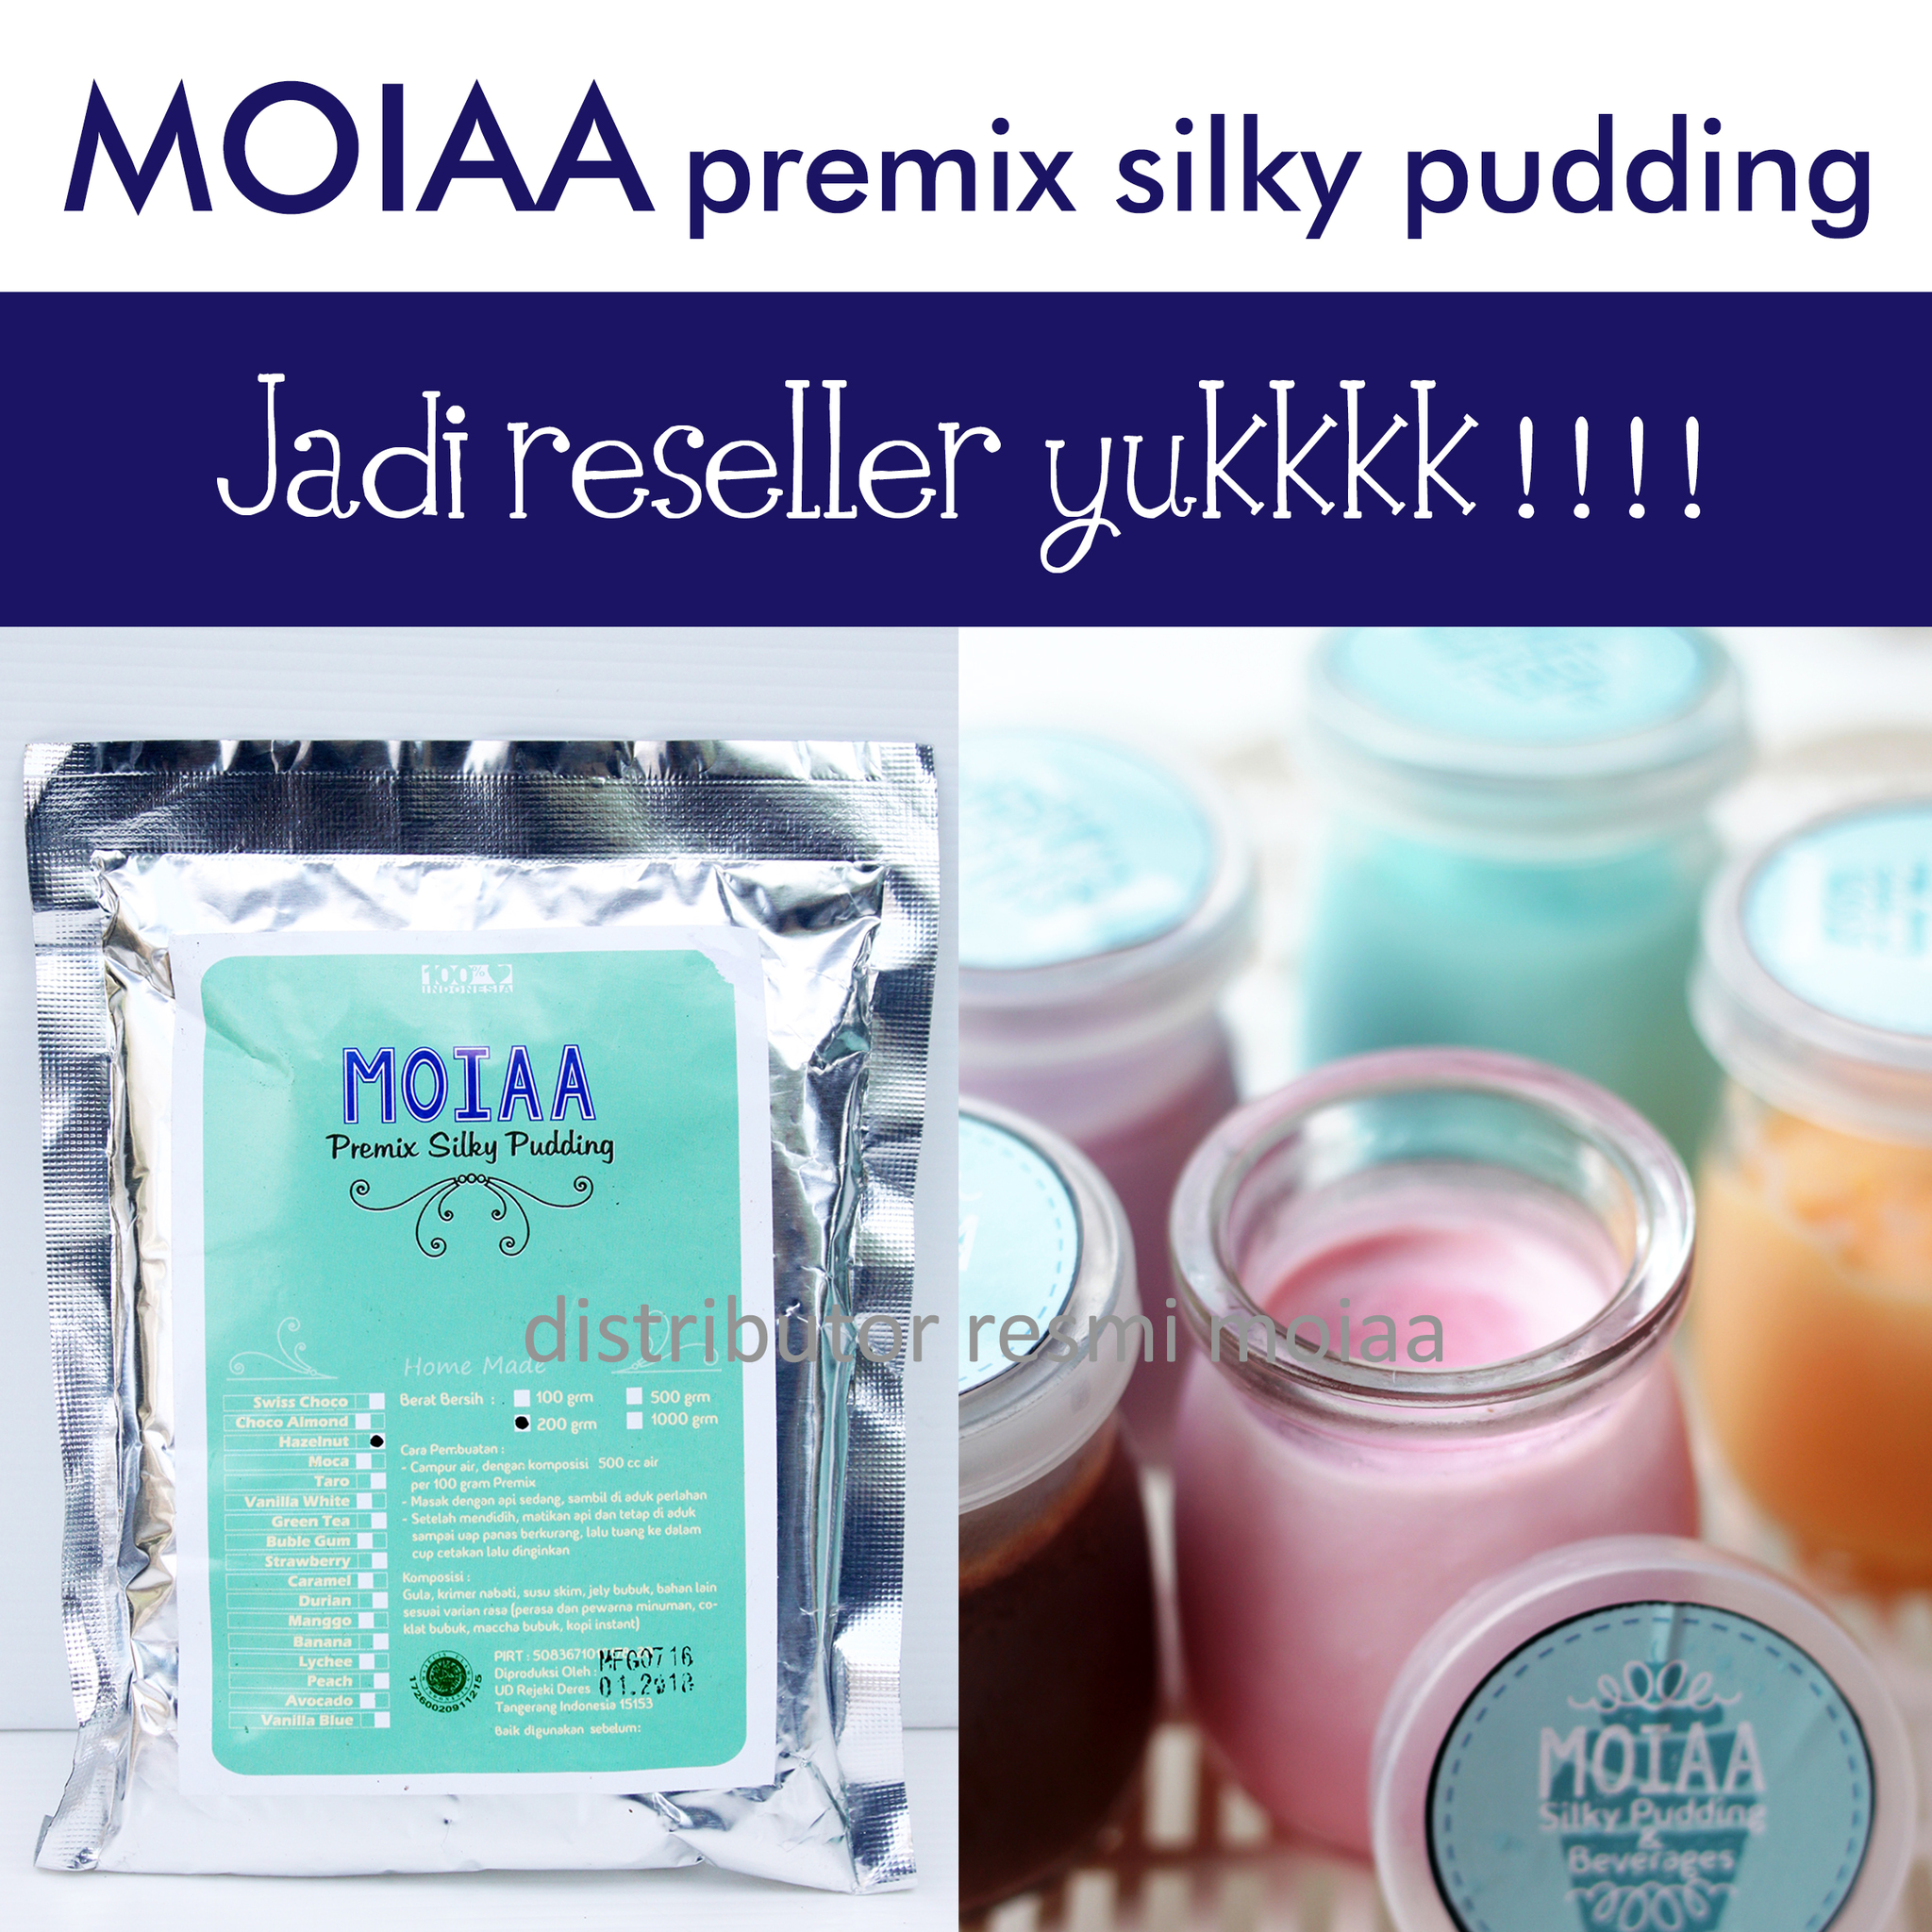 Jual Puding Silky Moiaa Kemasan 100 Gram Islesta Shop Tokopedia Premix Pudding